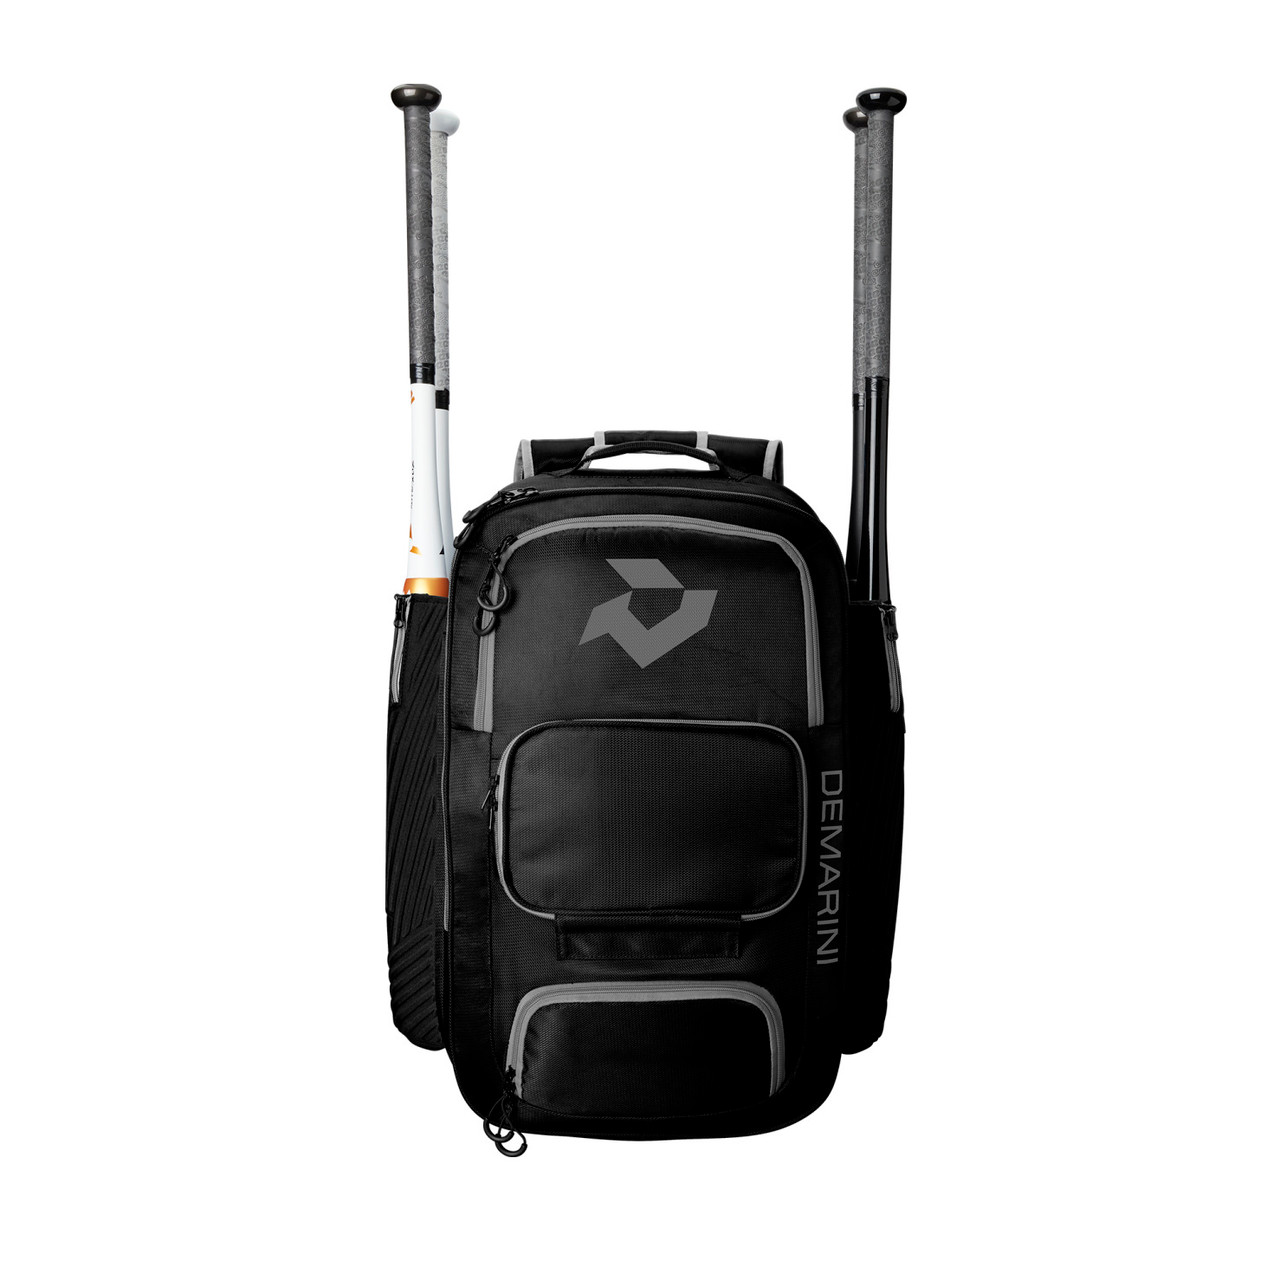 DeMarini Spectre Baseball/Softball Backpack Bag